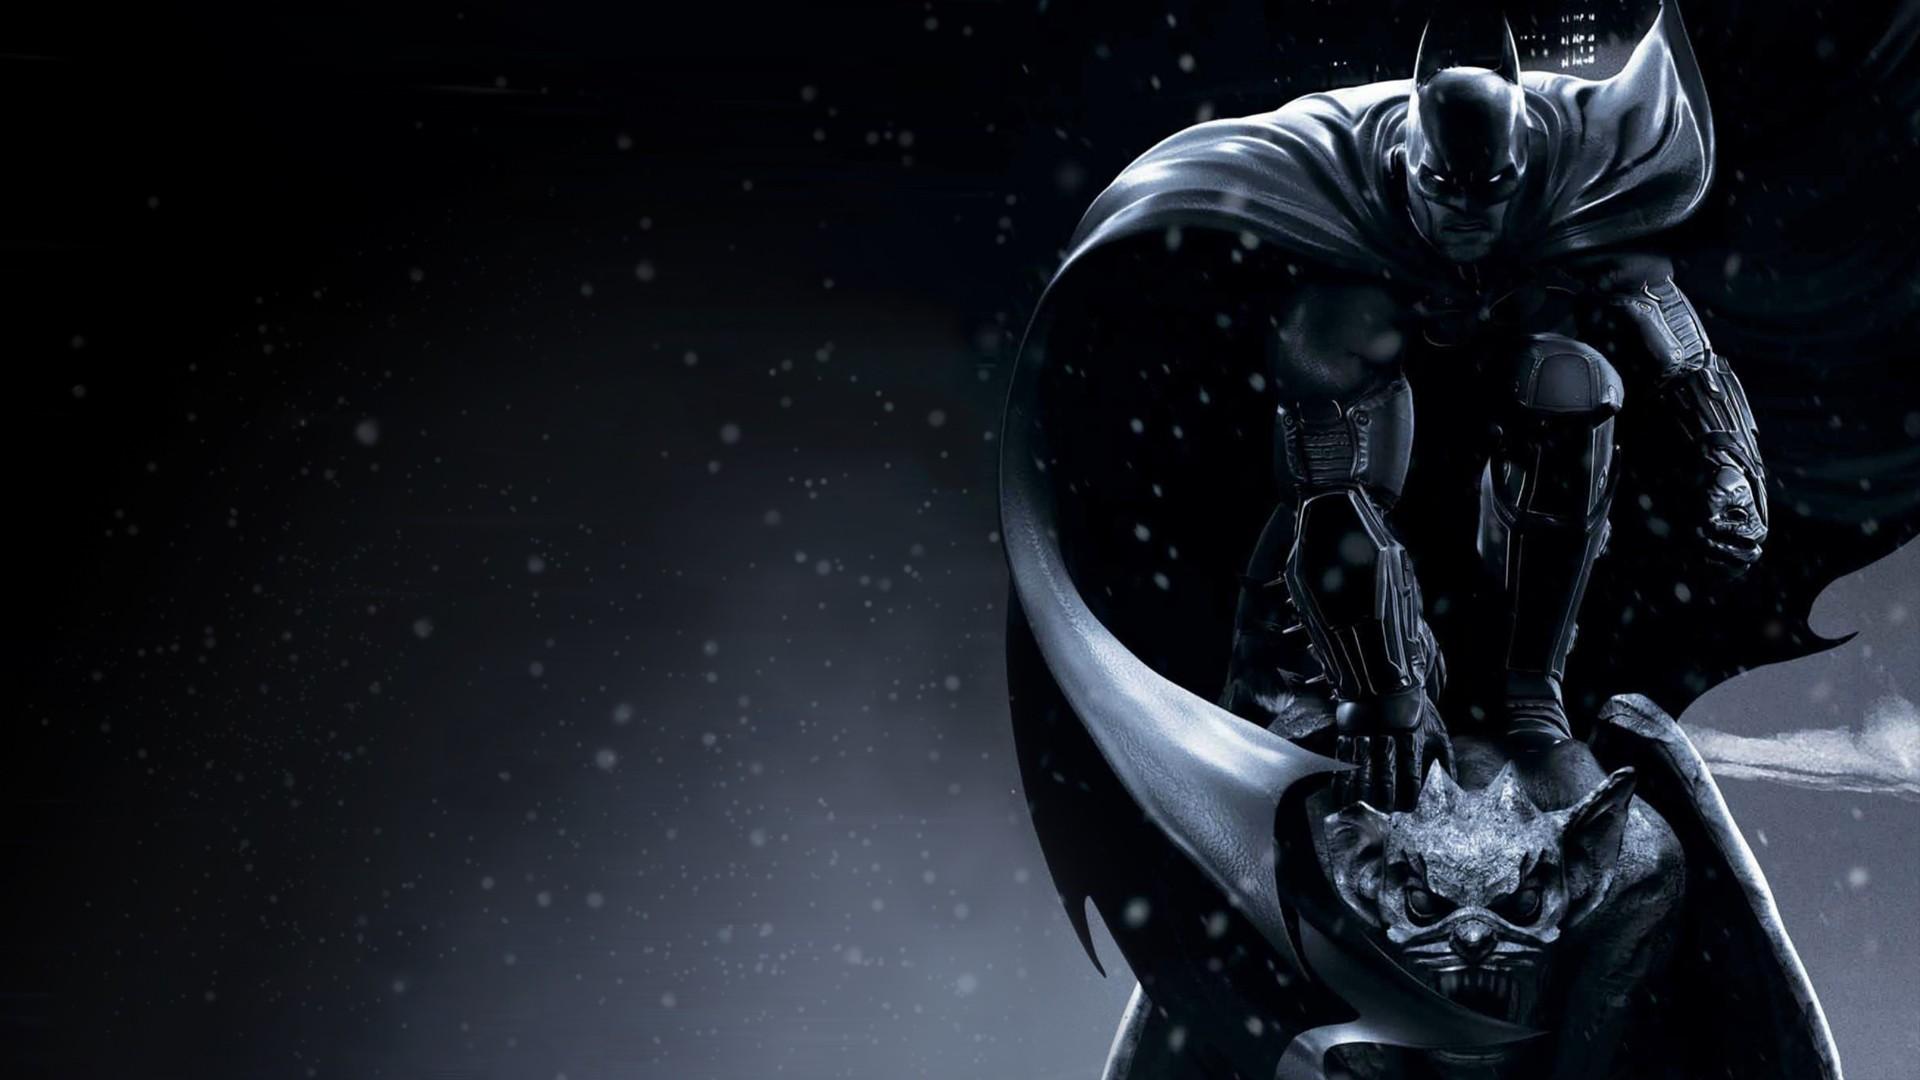 Batman Arkham Knight Wallpapers - WallpaperSafari